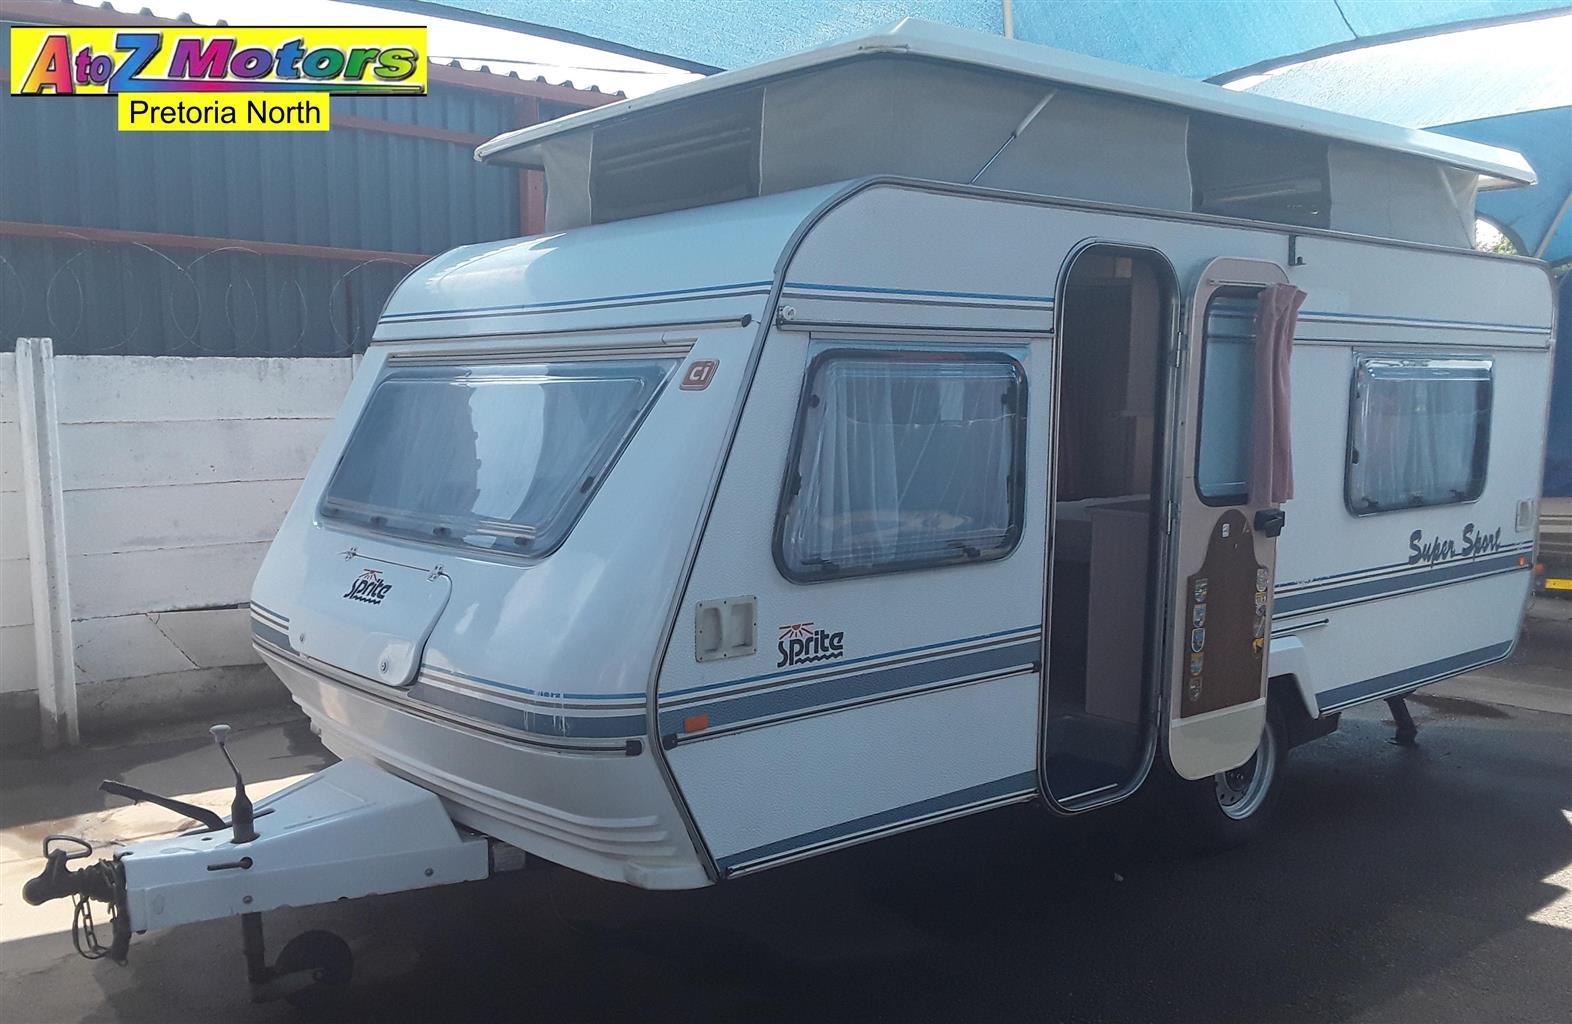 1992 Sprite Super Sport Caravan